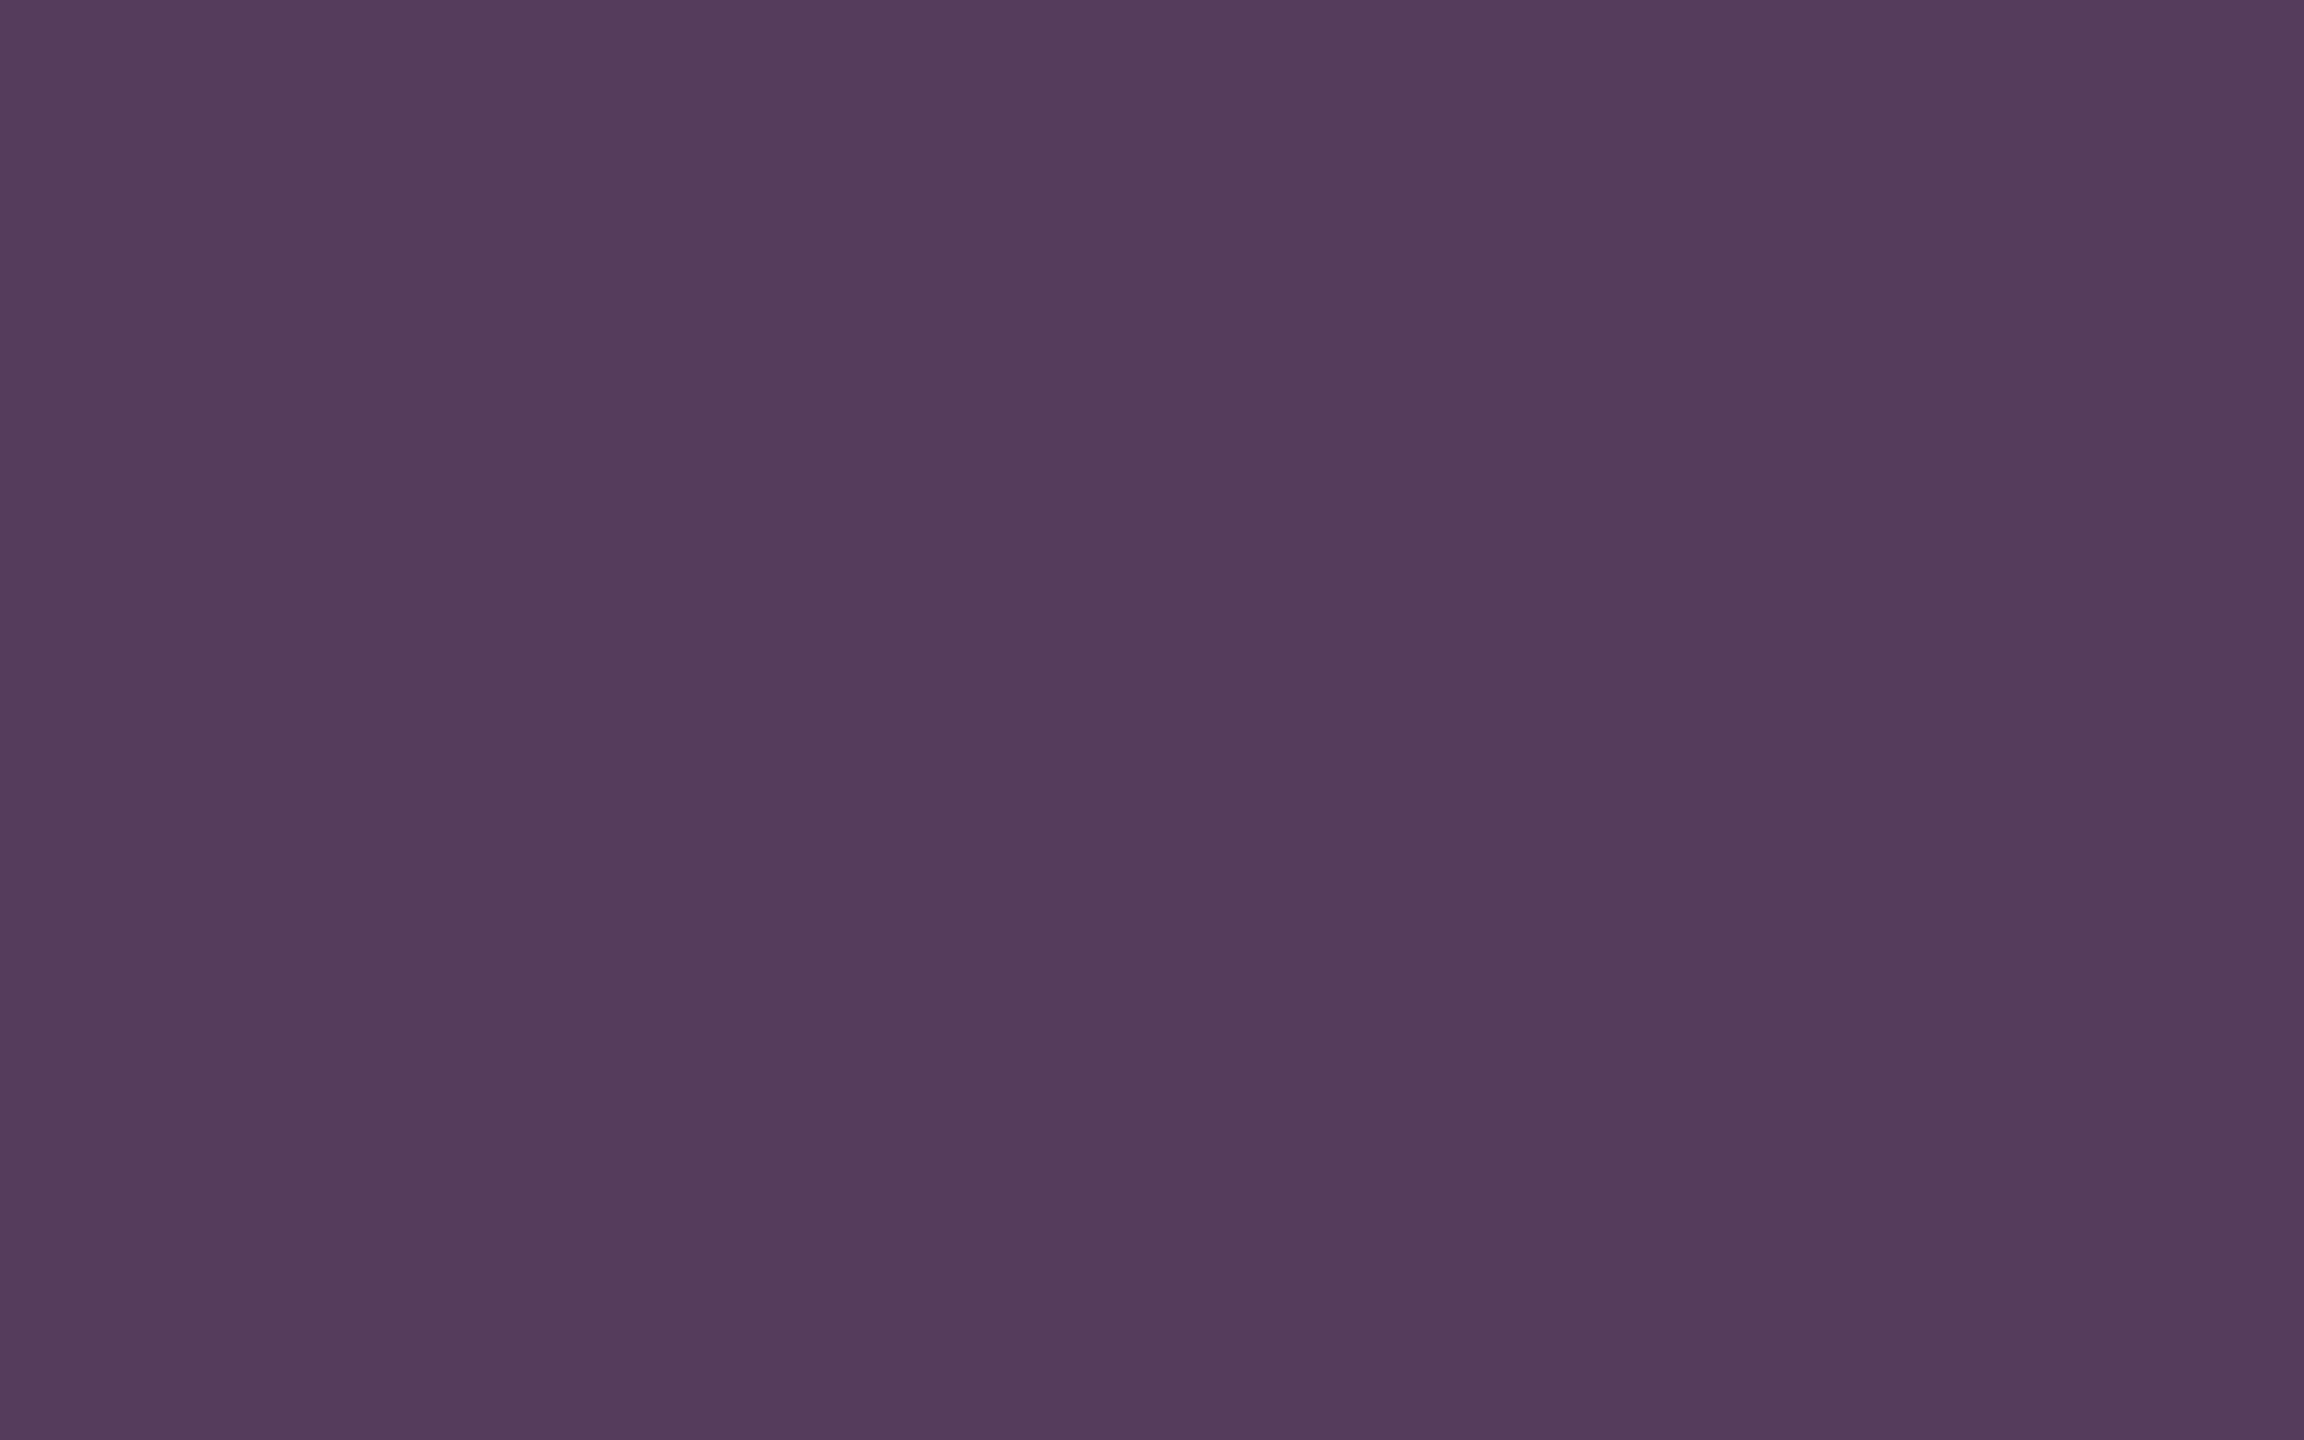 2304x1440 English Violet Solid Color Background